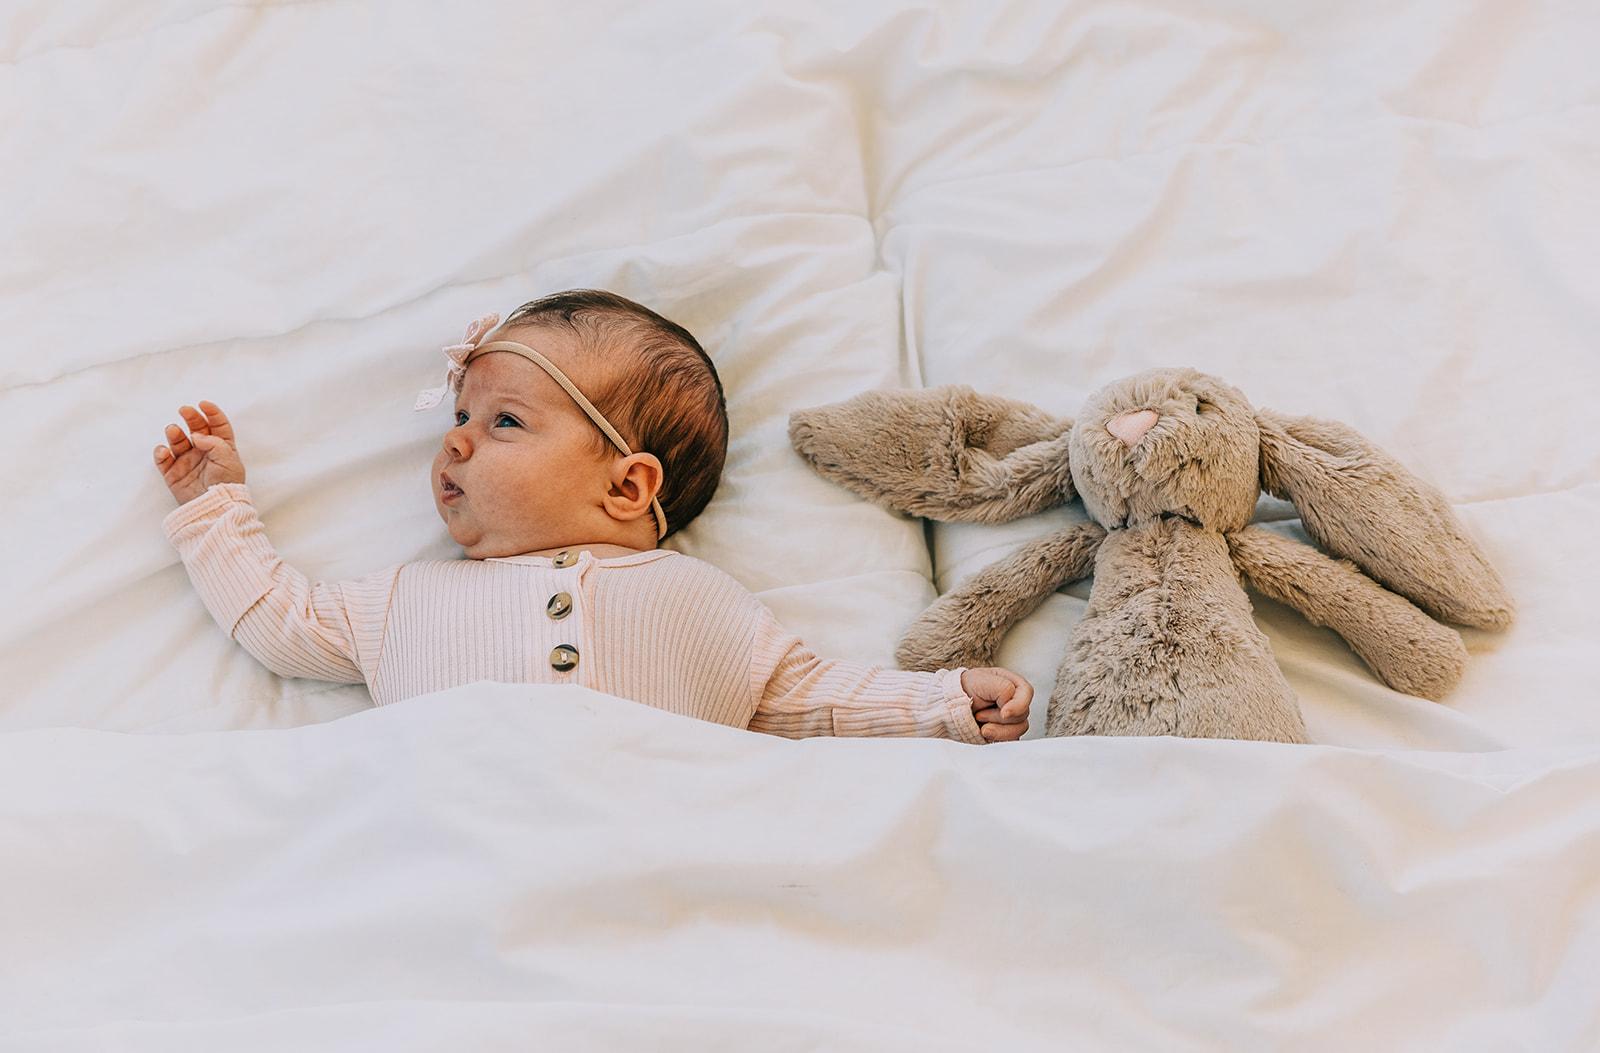 Darling newborn studio photo shoot for baby girl Leighton with her bunny in Logan, Utah by Bella Alder Photography in Blush Door Studio | #bellaalderphoto #newbornphotographer #utahnewbornphotos #babygirlnewborn #babygirl #blushdoorstudio #newbornsession #utahbabies #babyphotoshoot #newborns